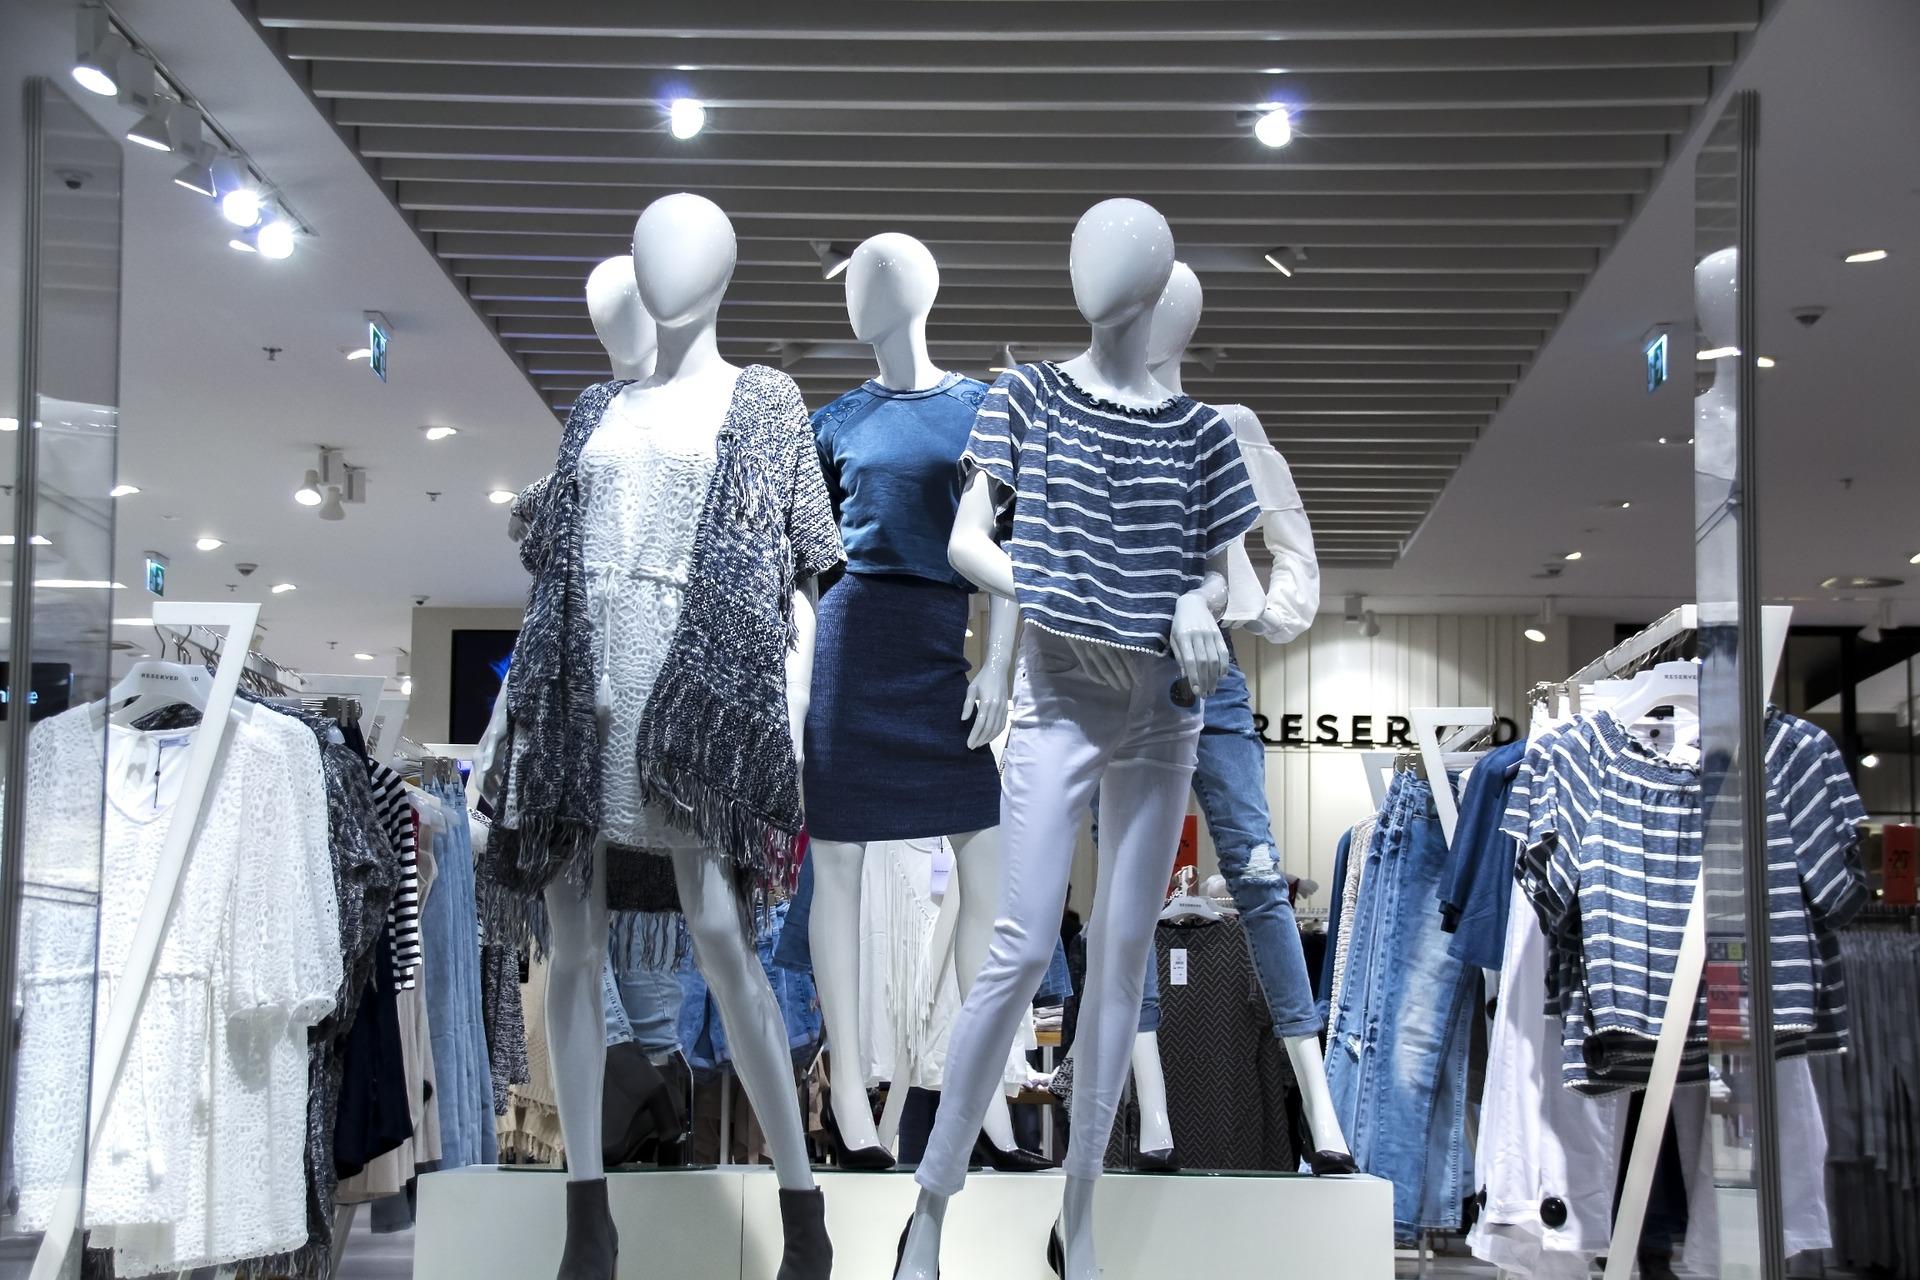 shopping-mall-1316787_1920.jpg